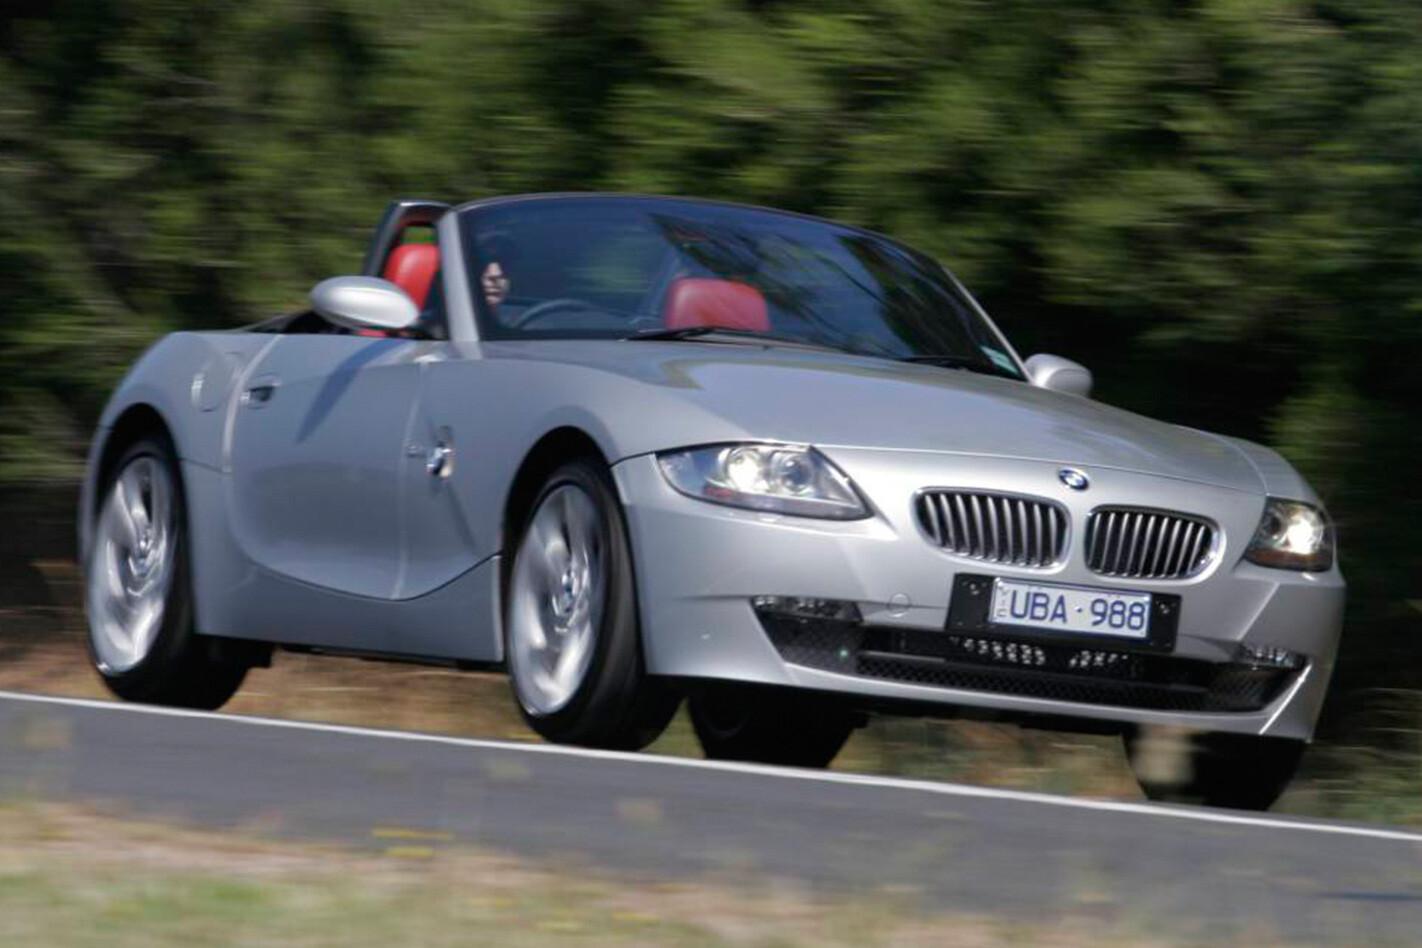 BMW Z4 3.0 front